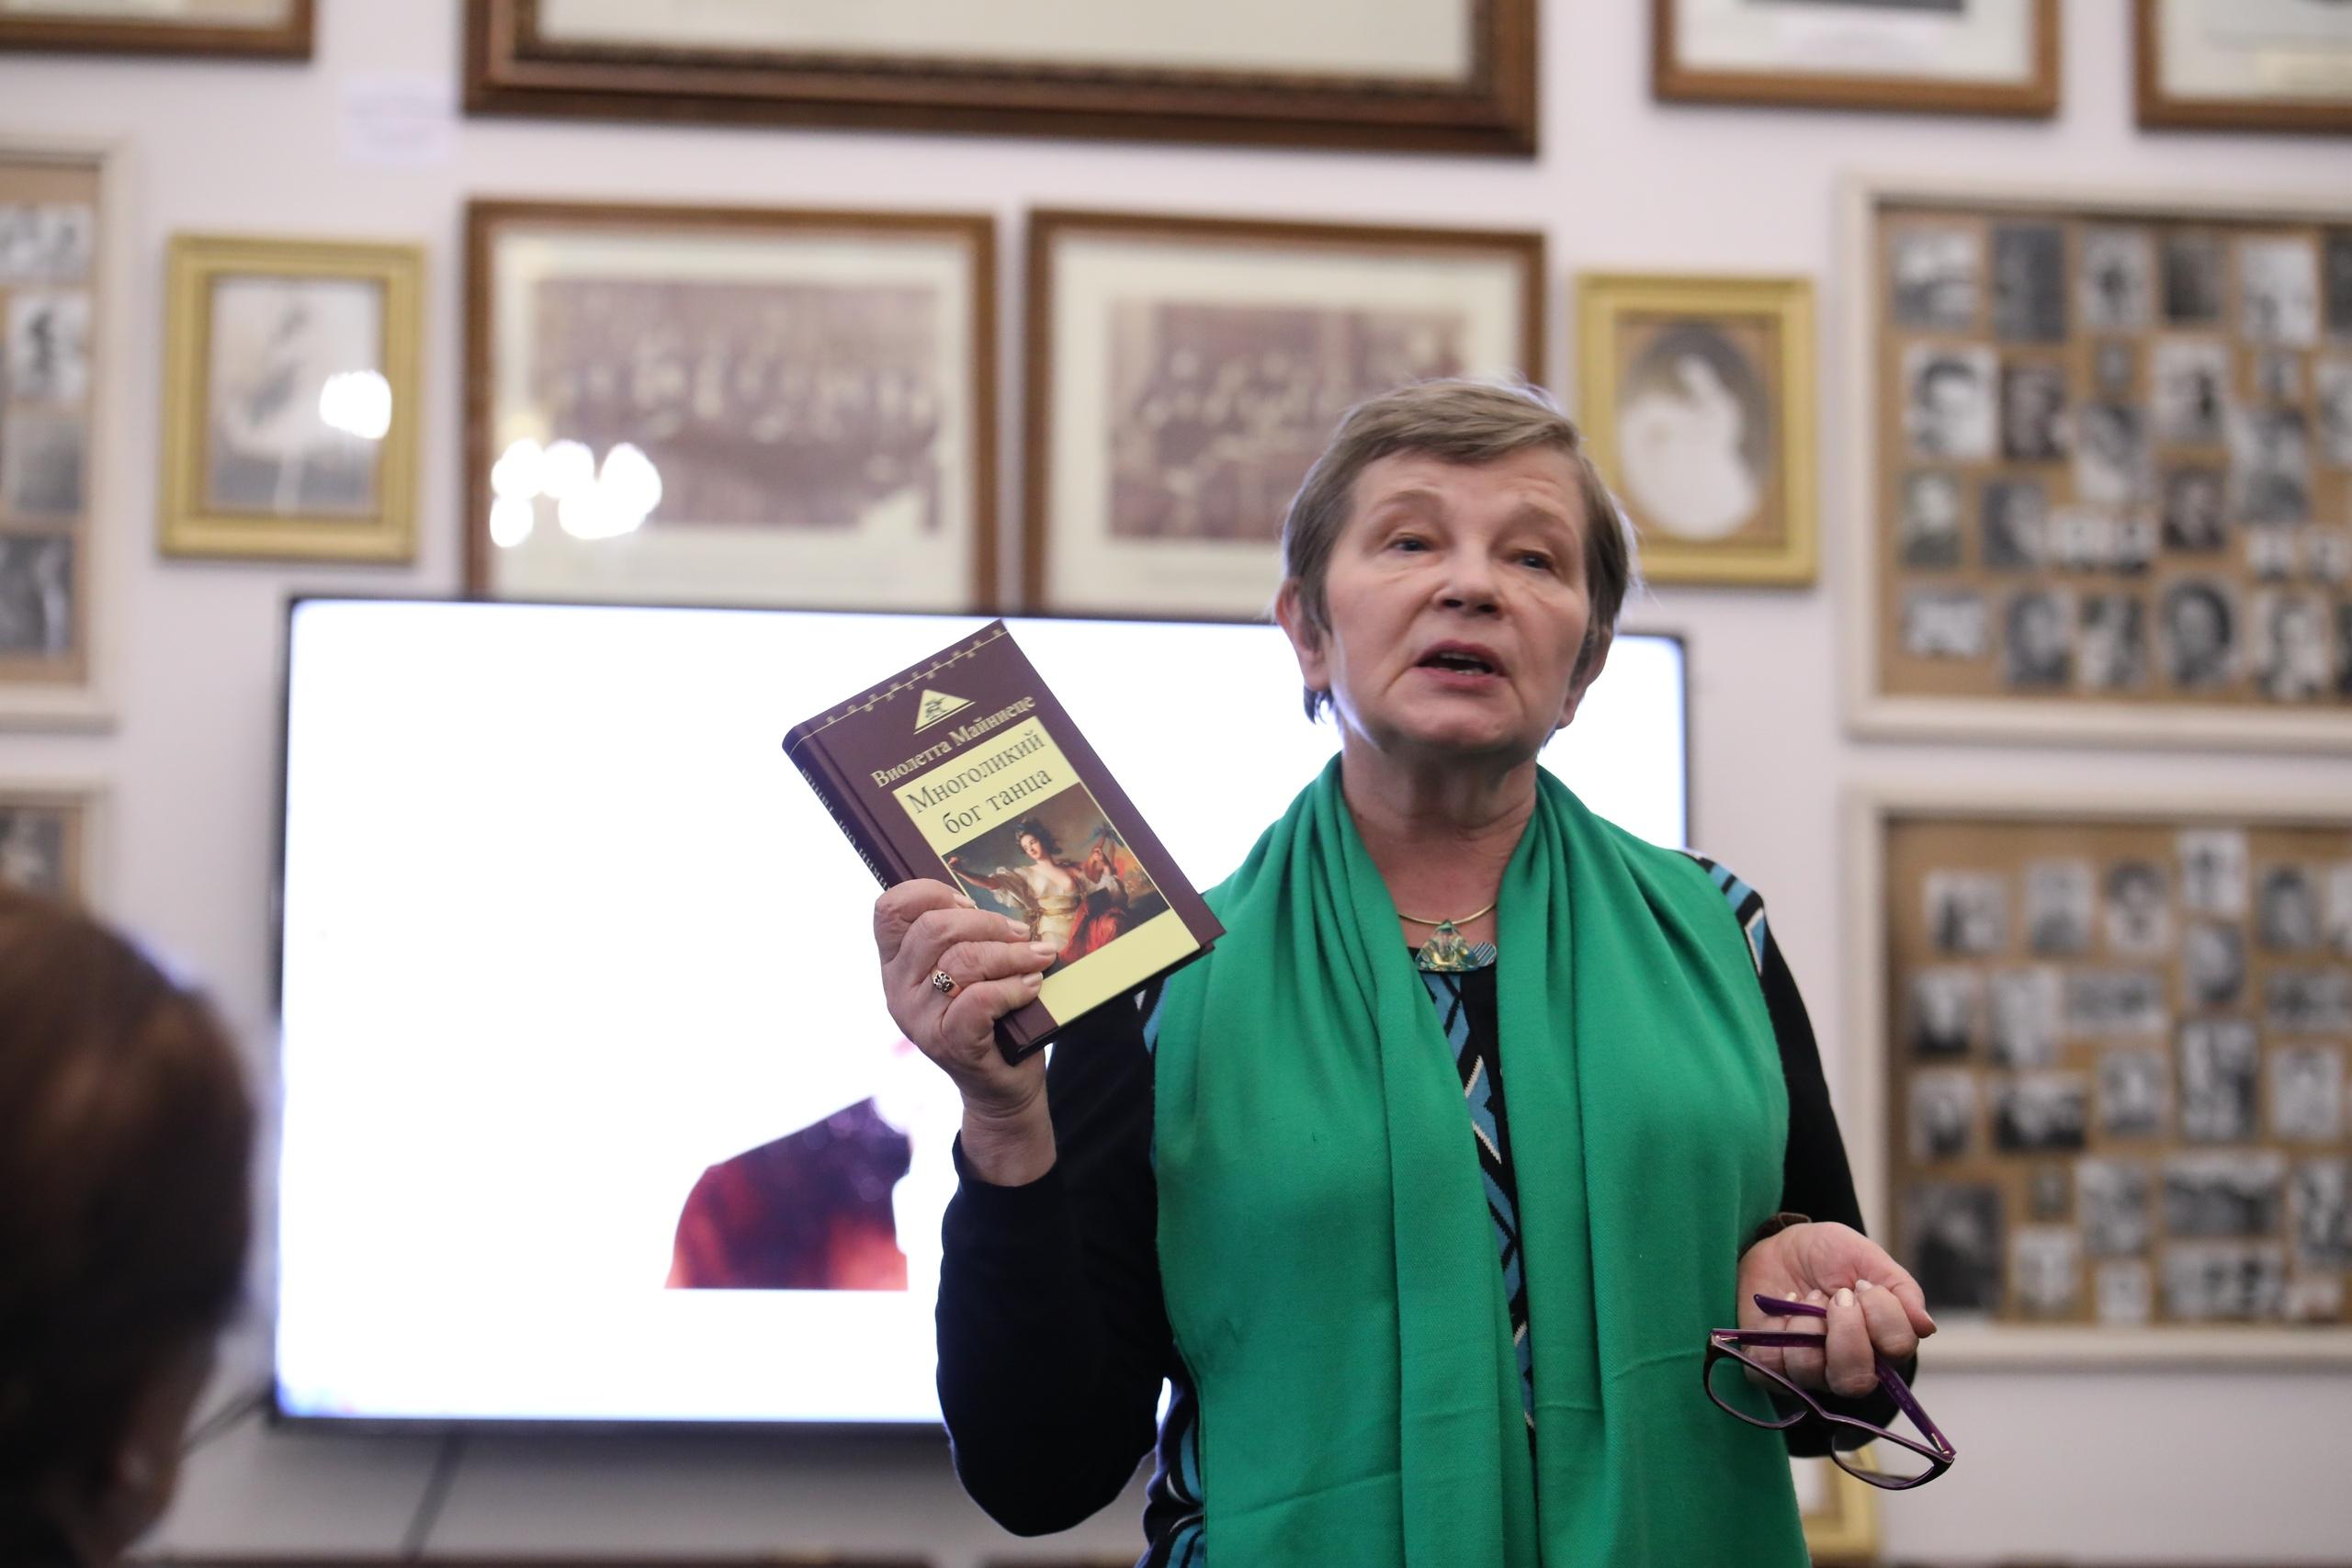 В.А. Майниеце представляет свою книгу.